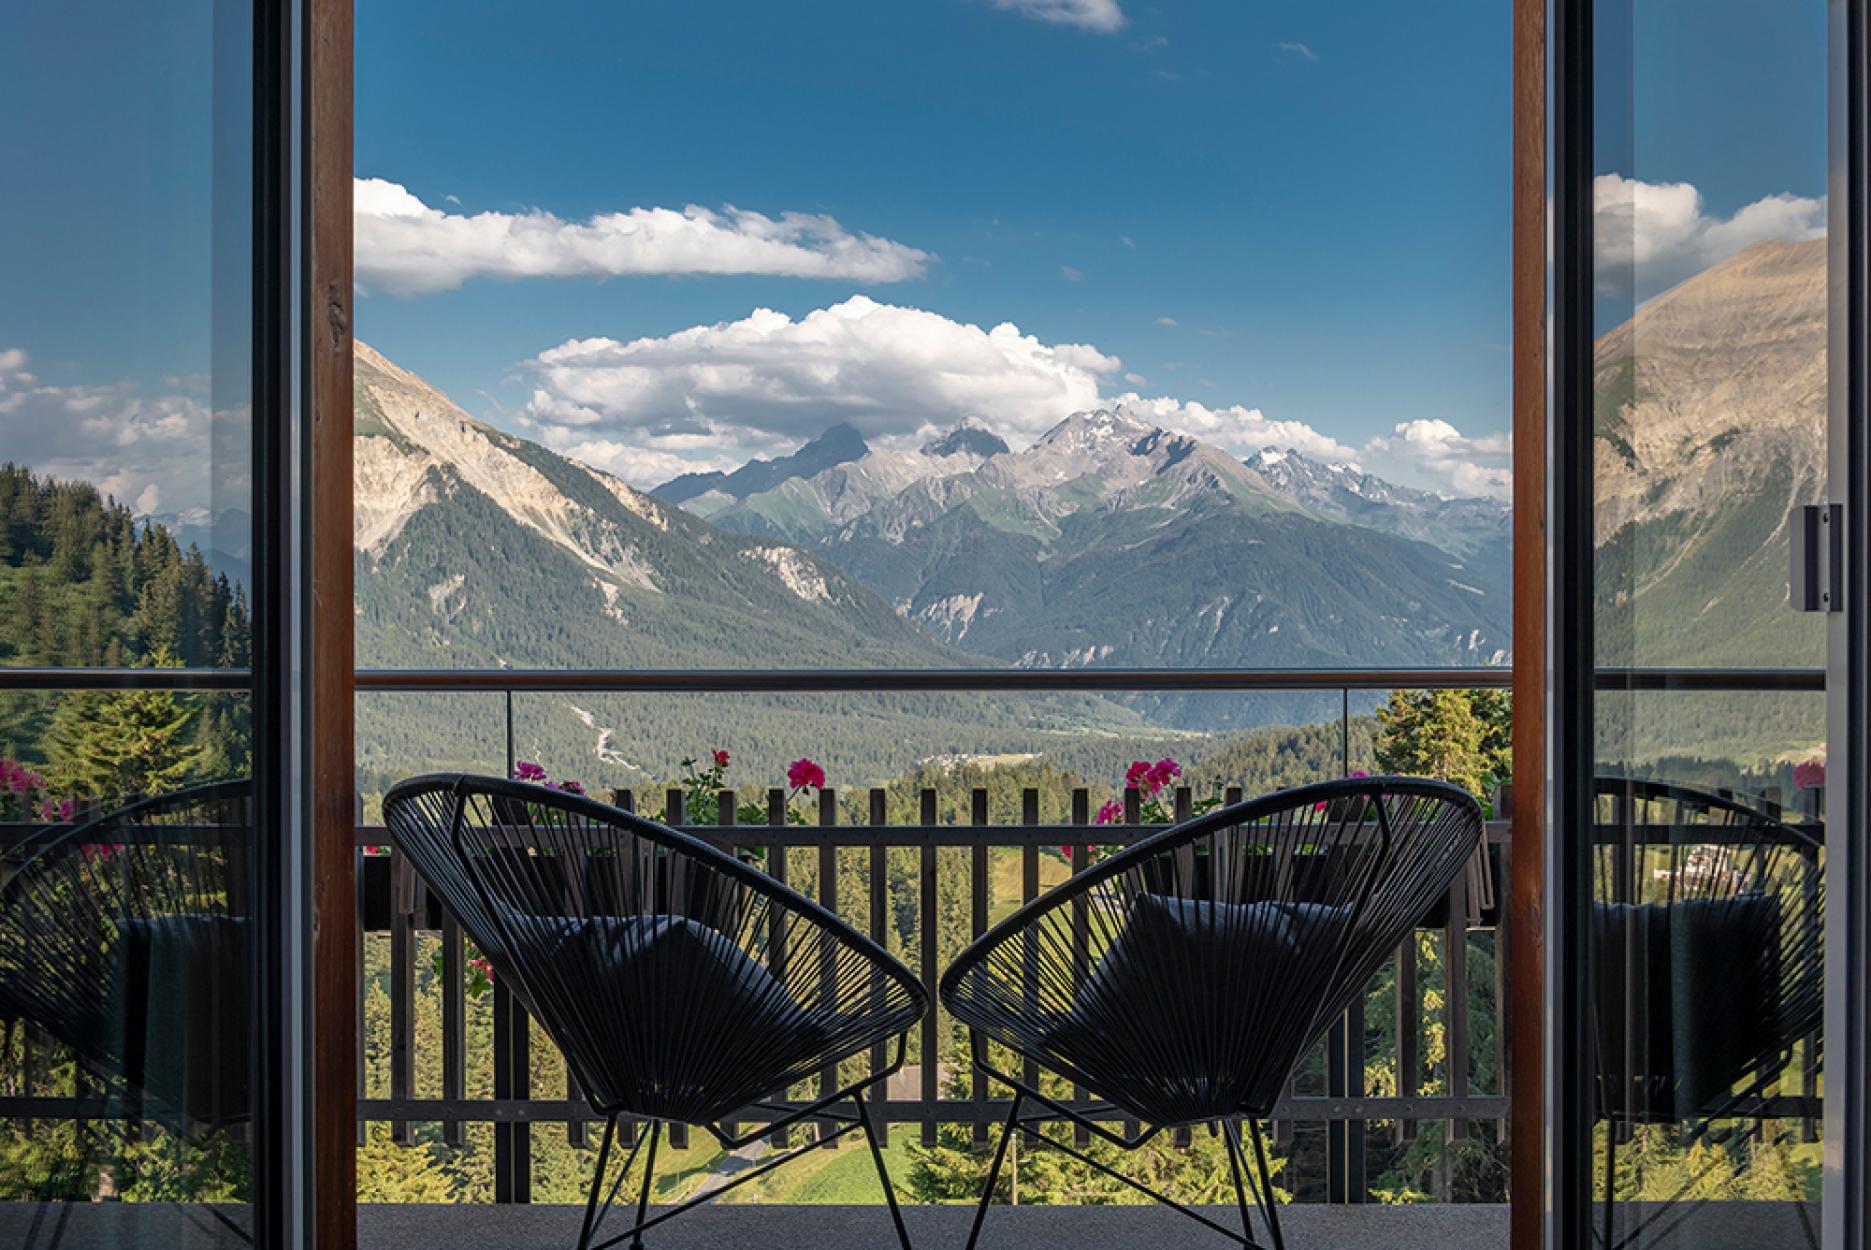 Hotel Tgantieni Lenzerheide, graubündenBIKE-Hotel